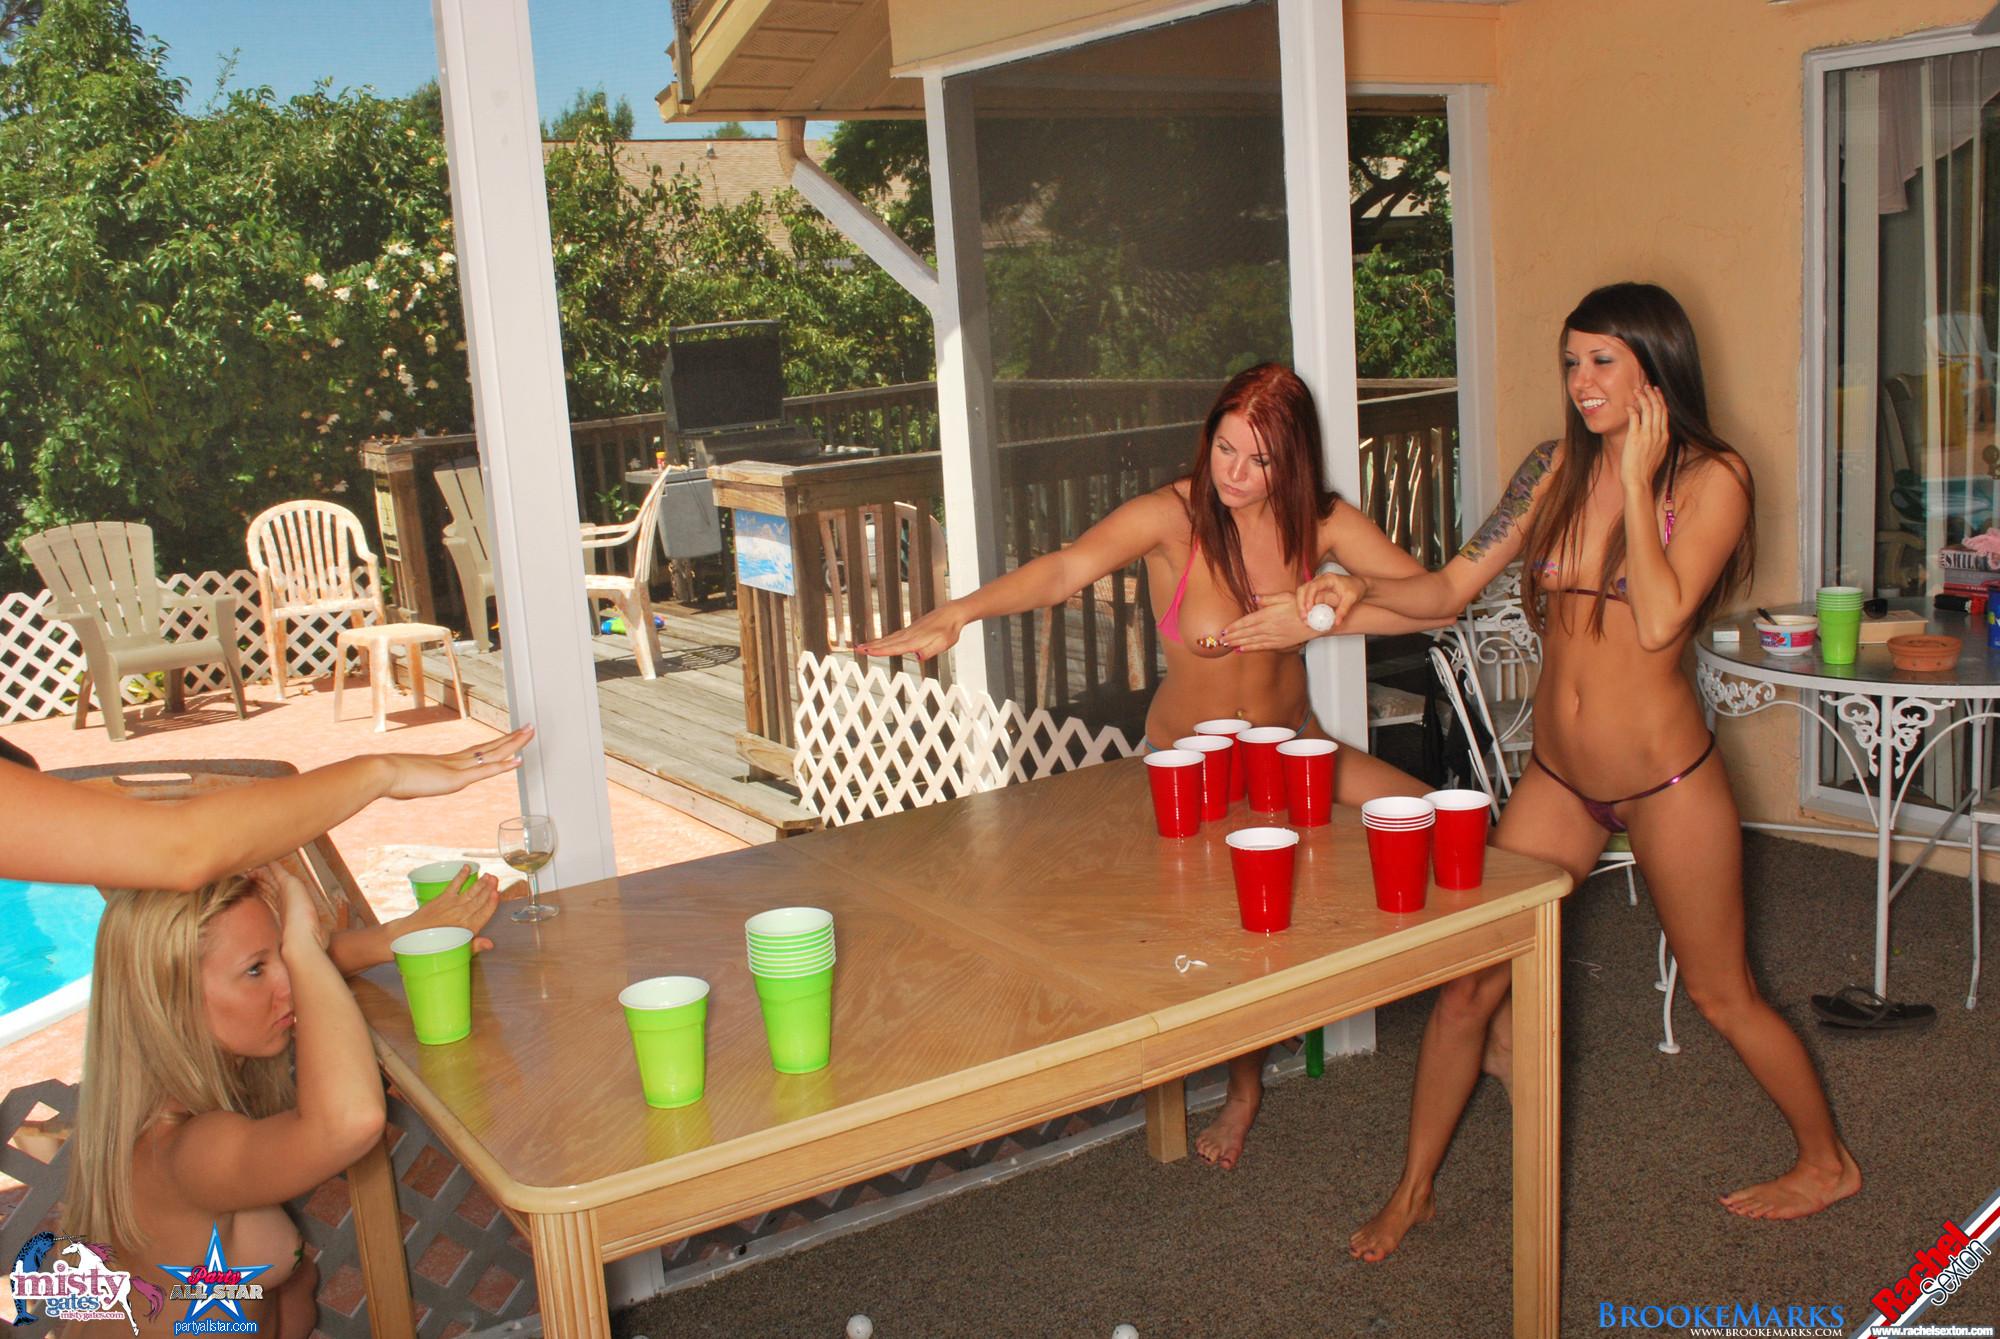 rachel-misty-nude-pics